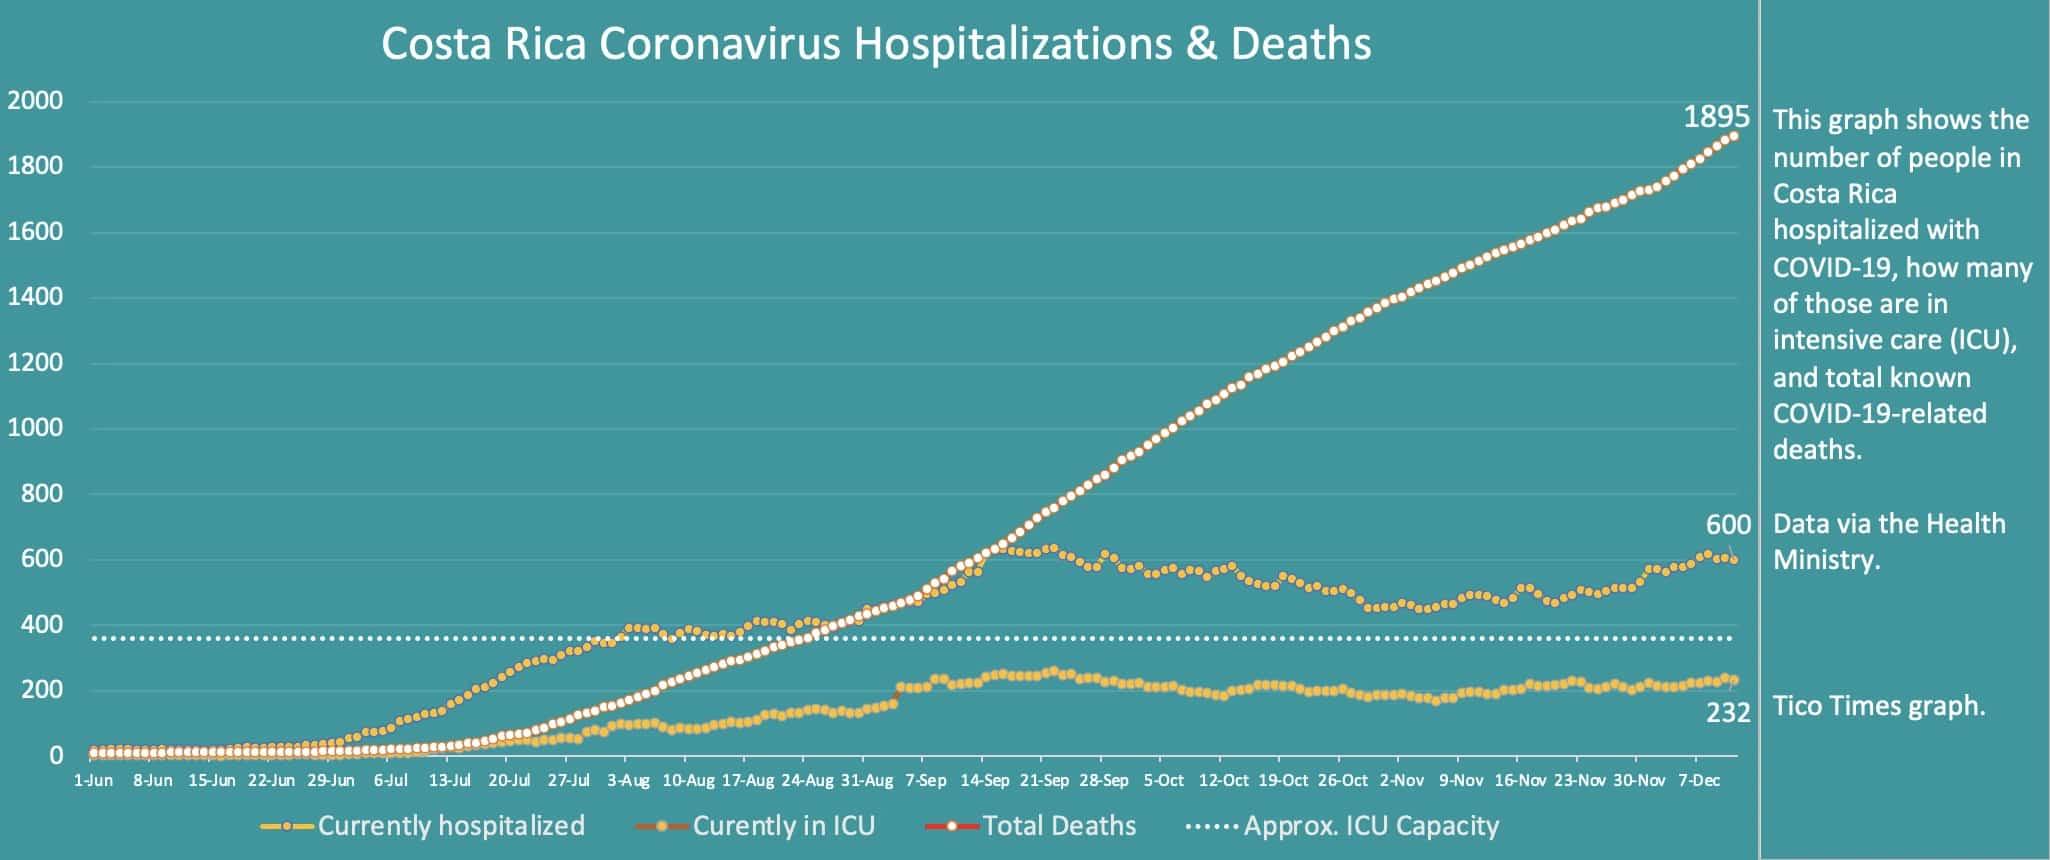 Costa Rica coronavirus hospitalizations and deaths on December 11, 2020